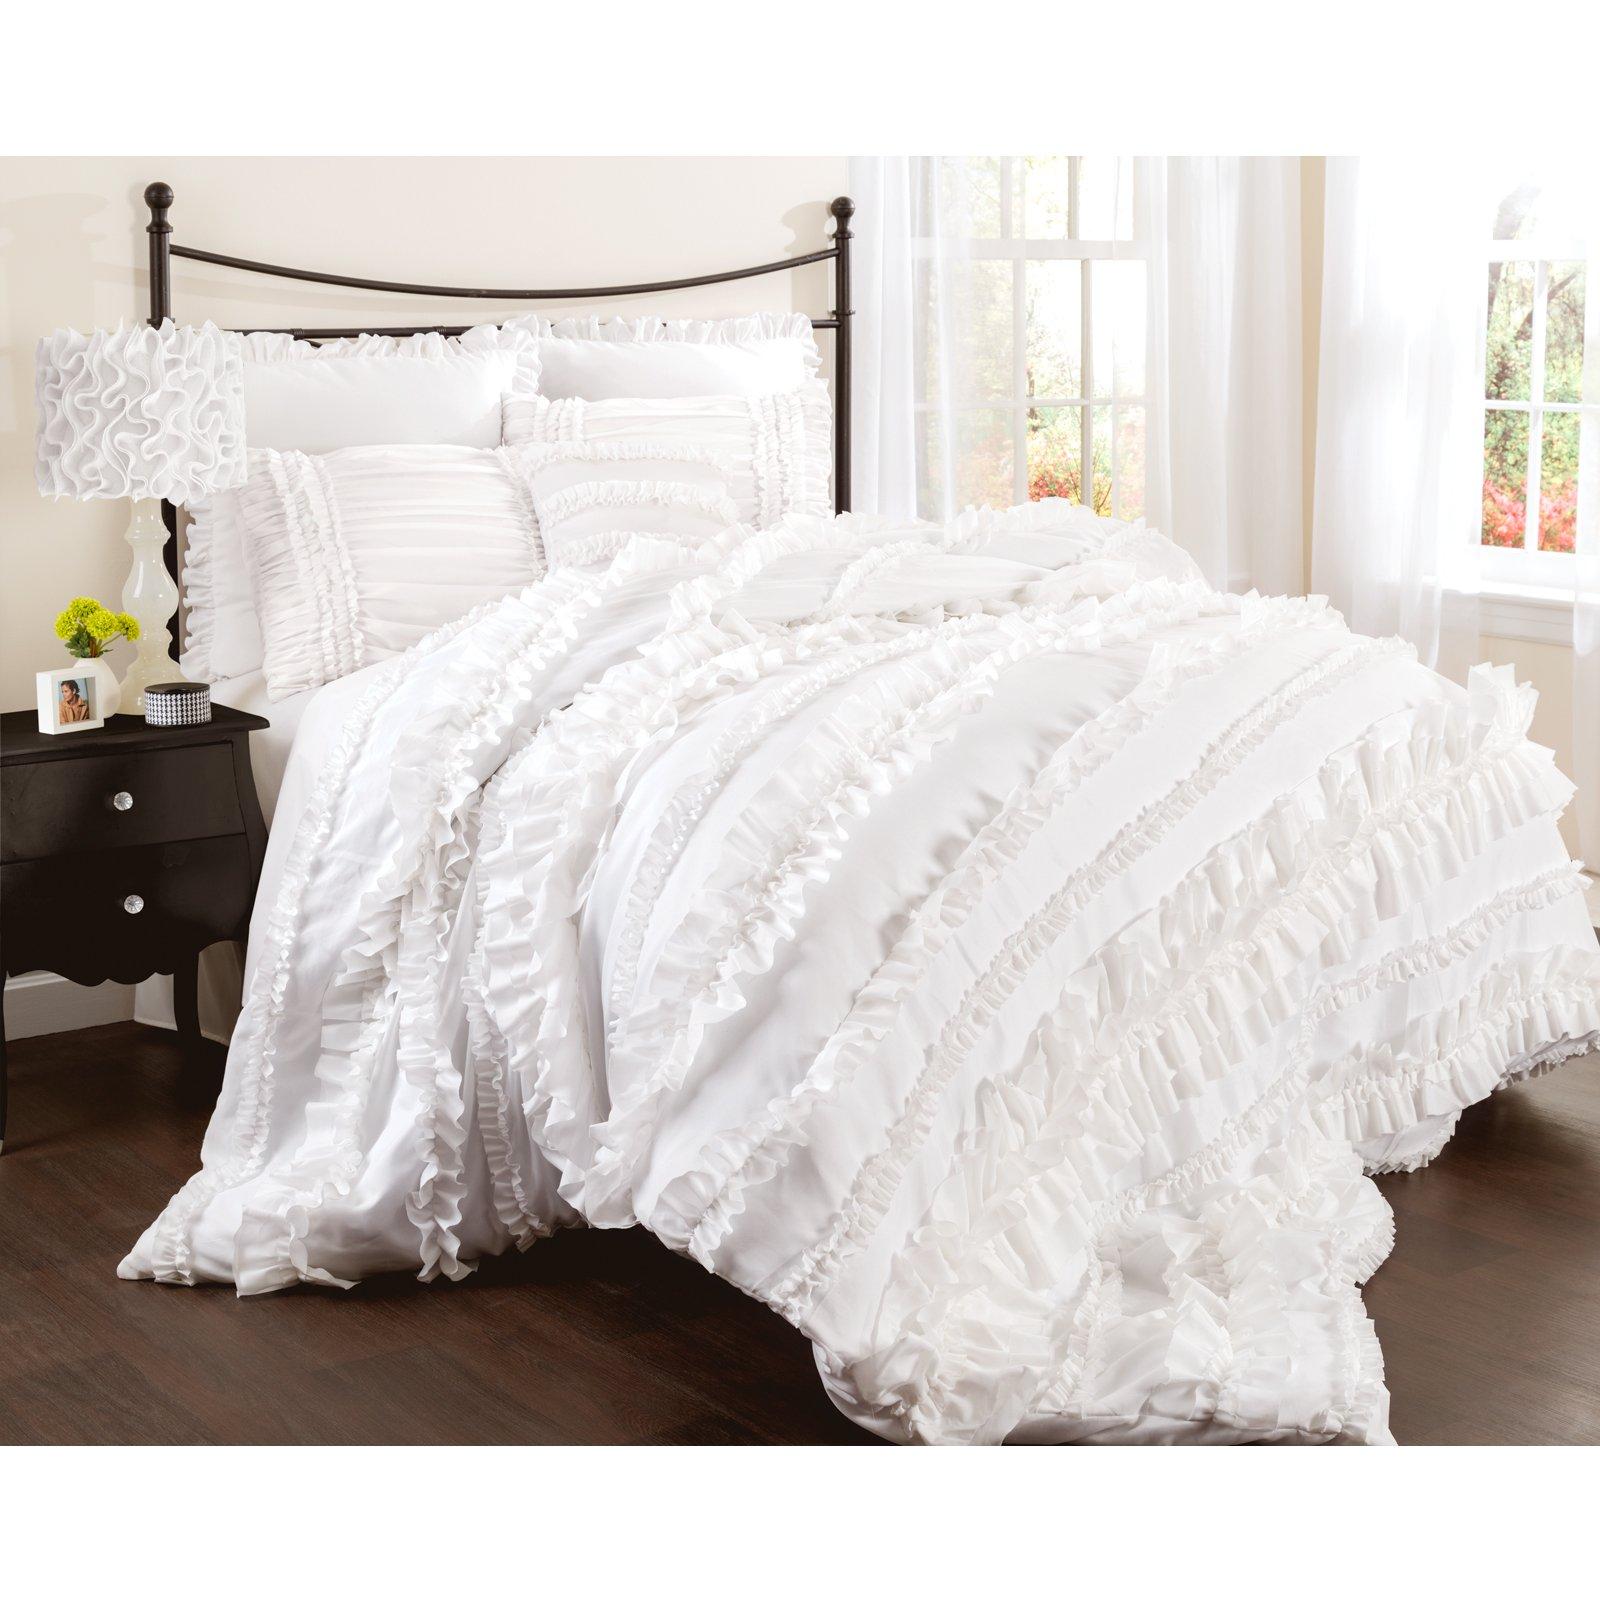 Lush Decor Belle 4 Piece Comforter Set, Queen, White